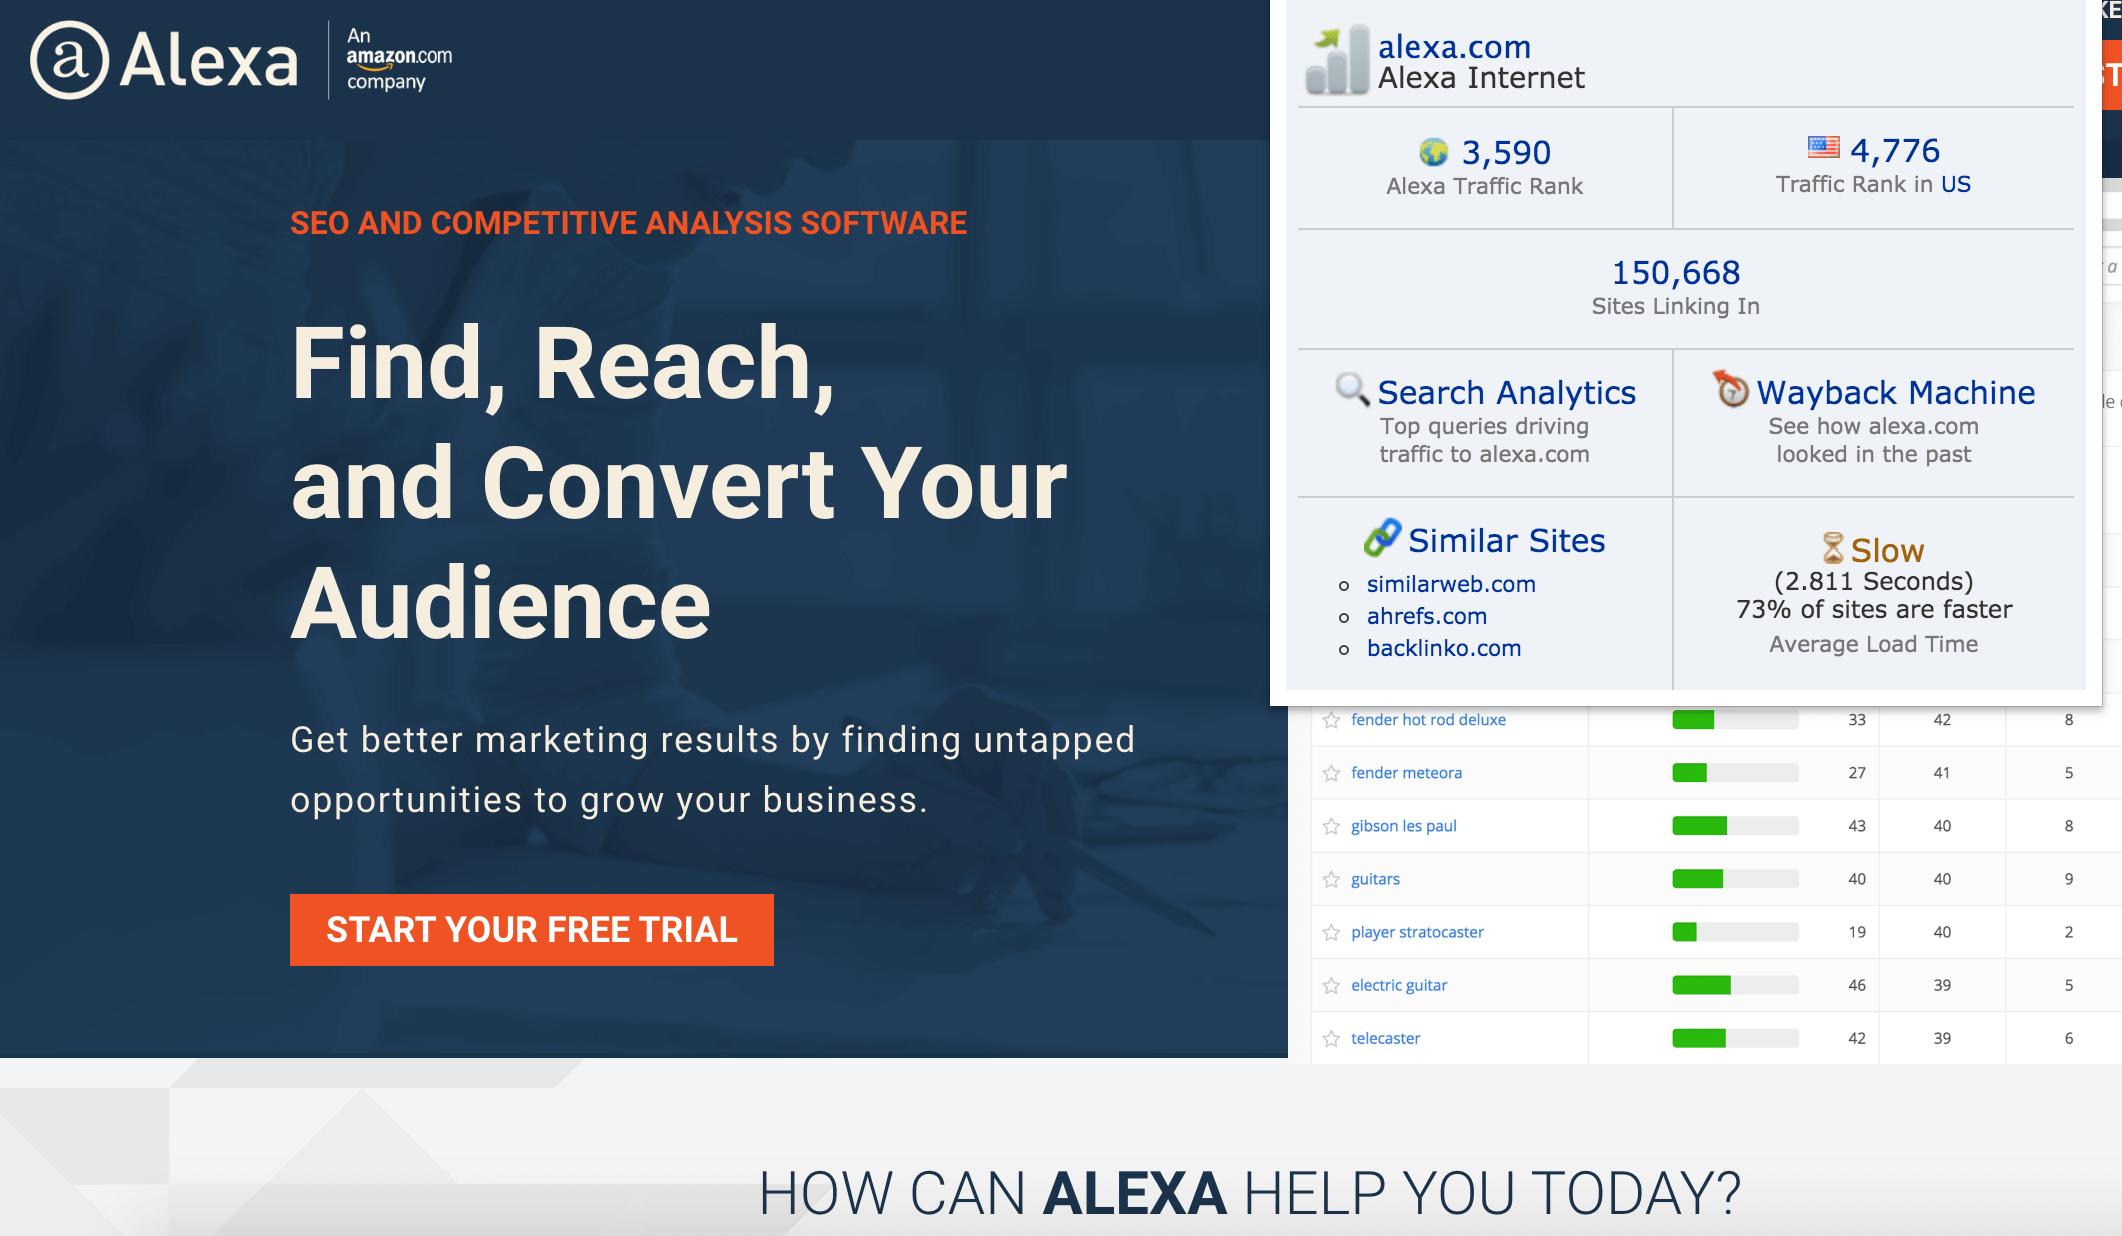 Is Alexa average load time correct